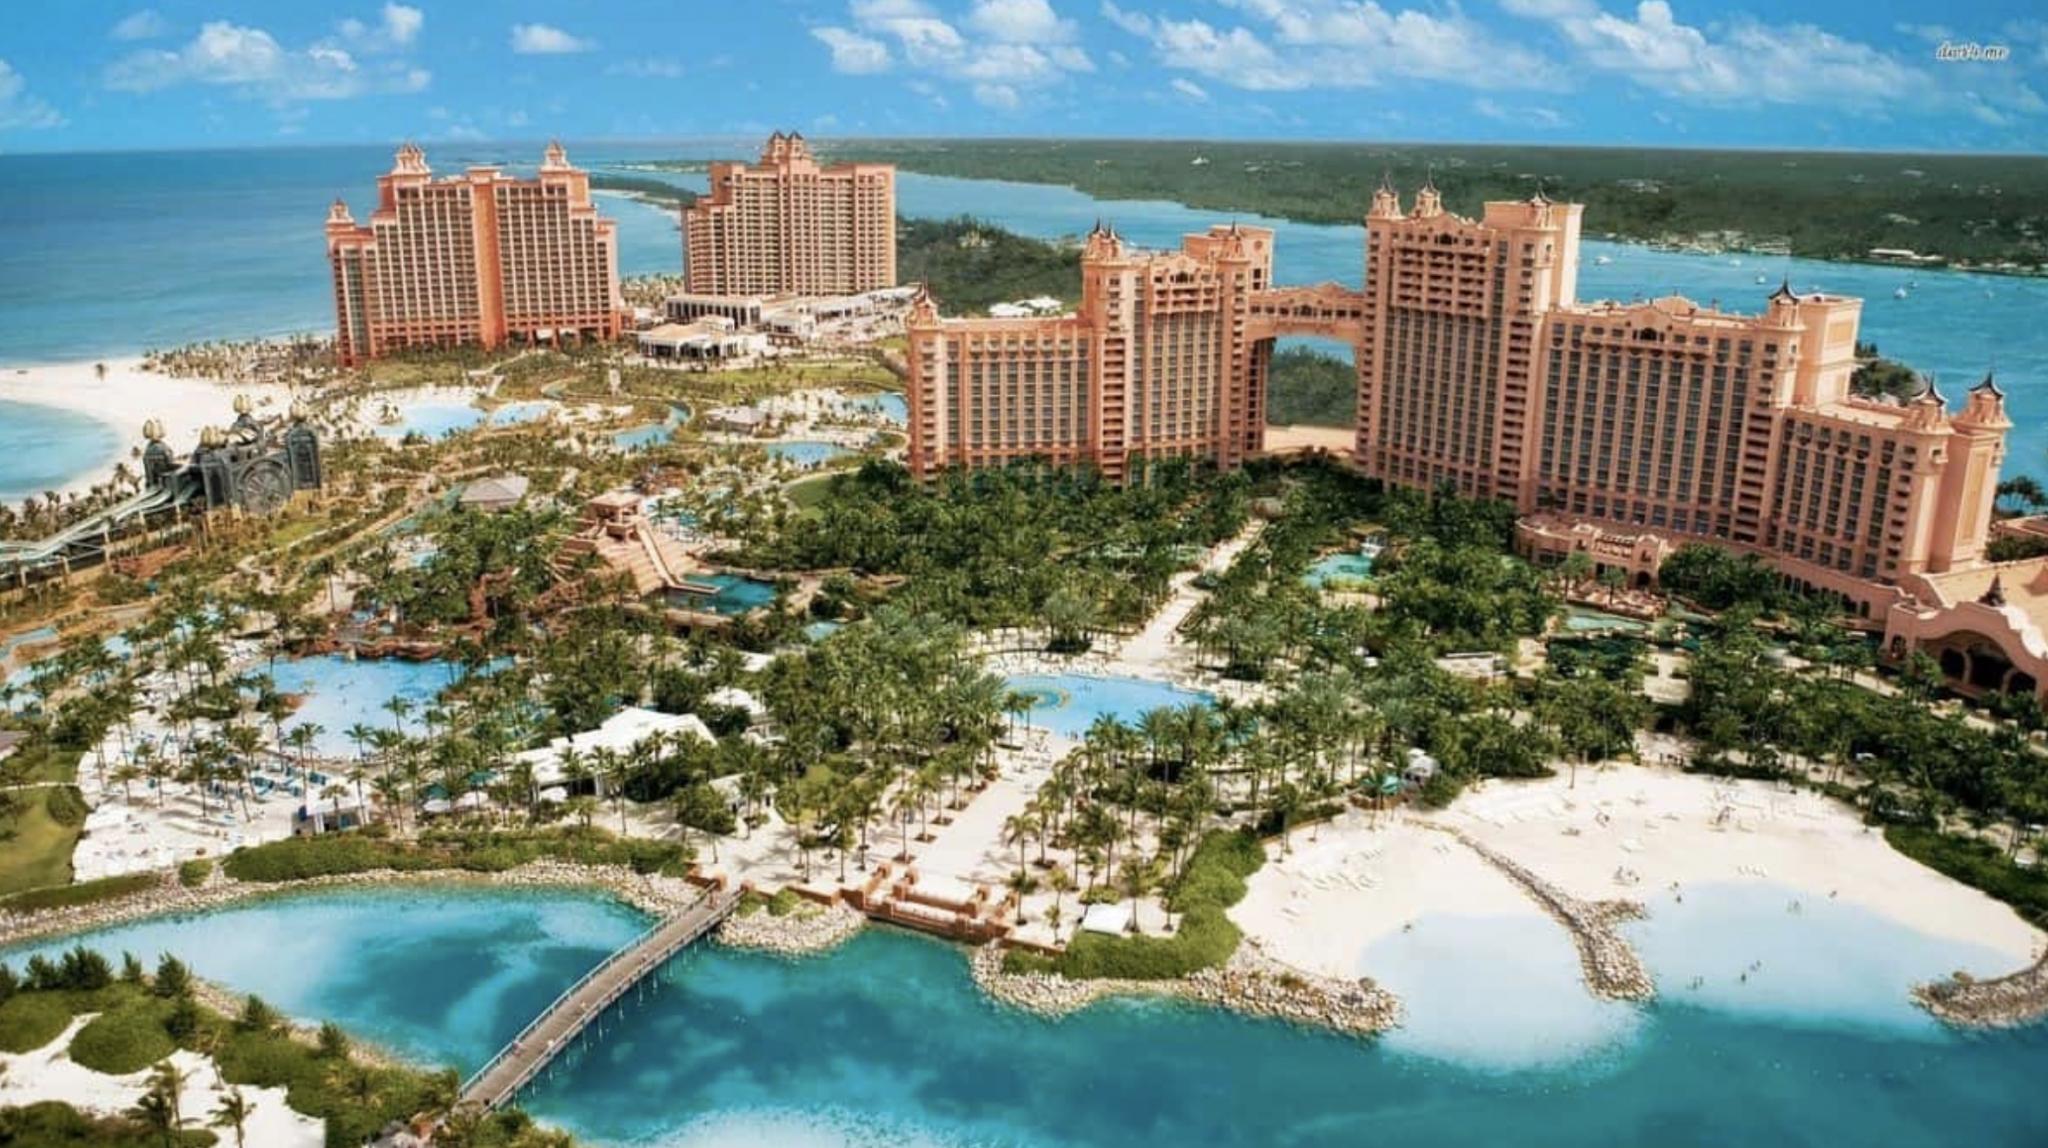 Vip Tips For Atlantis Resort Bahamas | Atlantis Resort within Travel To Atlantis Resort Bahamas